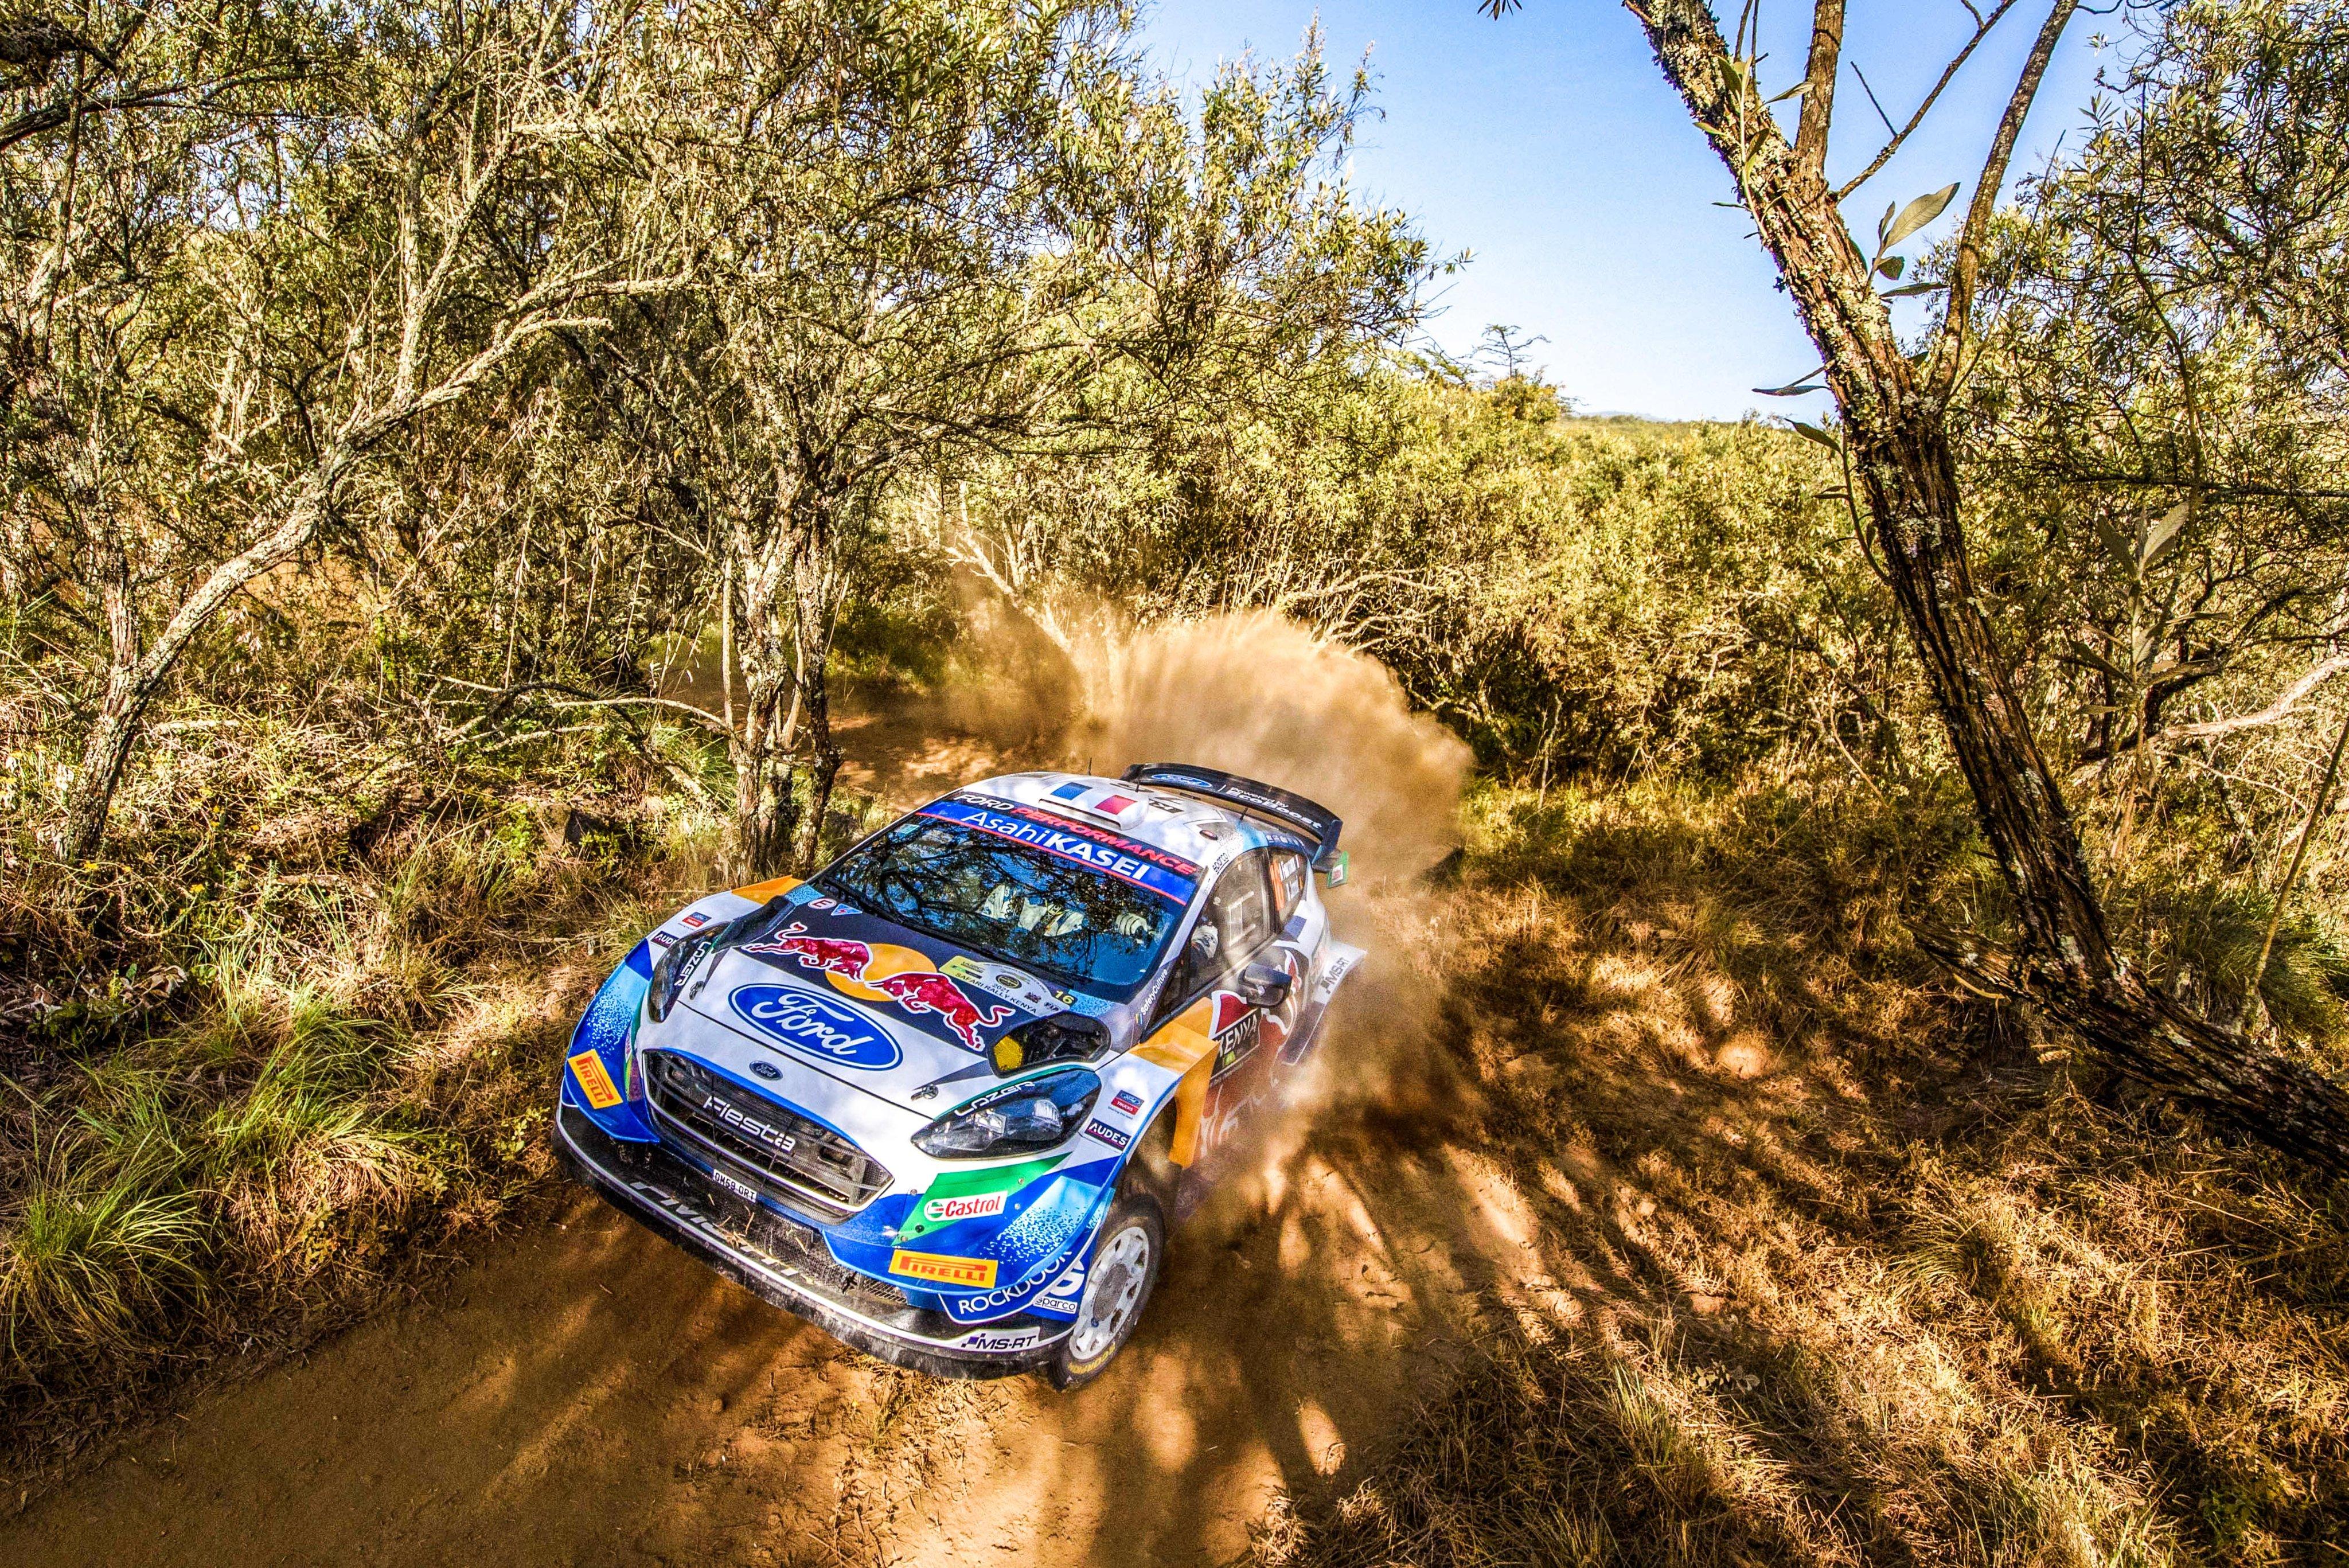 WRC: Safari Rally Kenya [23-27 Junio] - Página 4 E4zo4YsWUAEEXfT?format=jpg&name=4096x4096